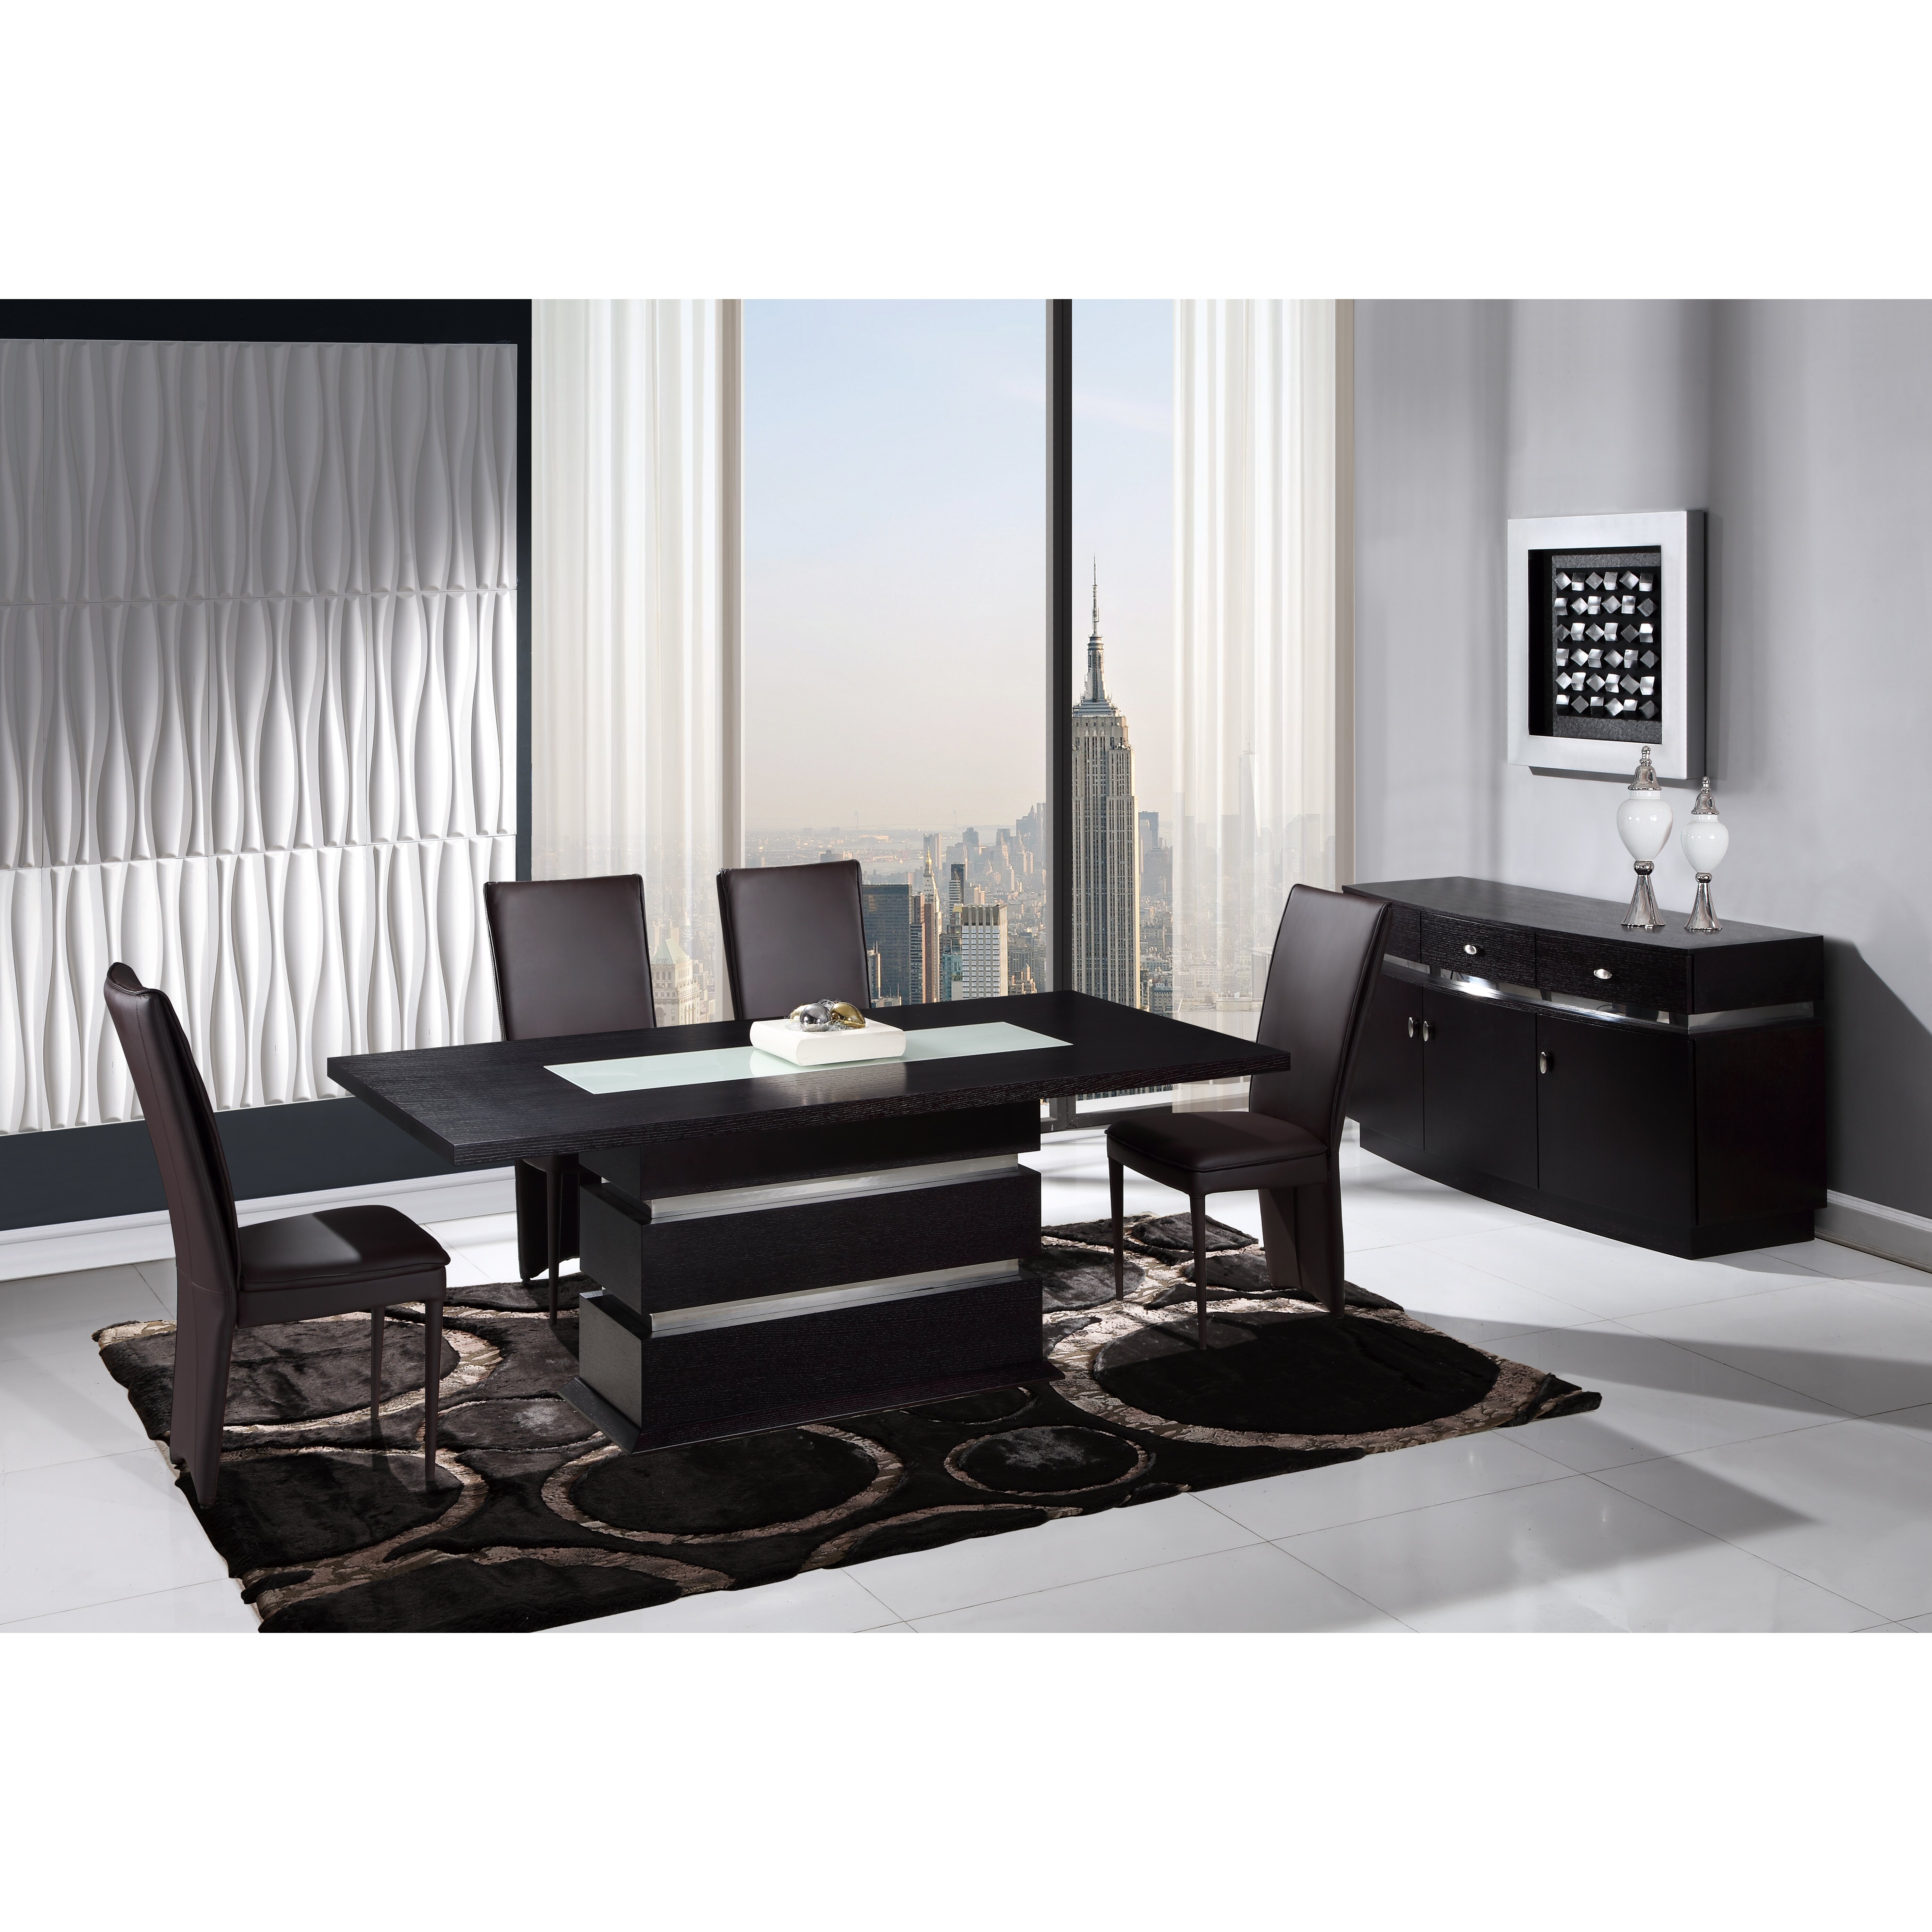 Global furniture usa extendable dining table wayfair